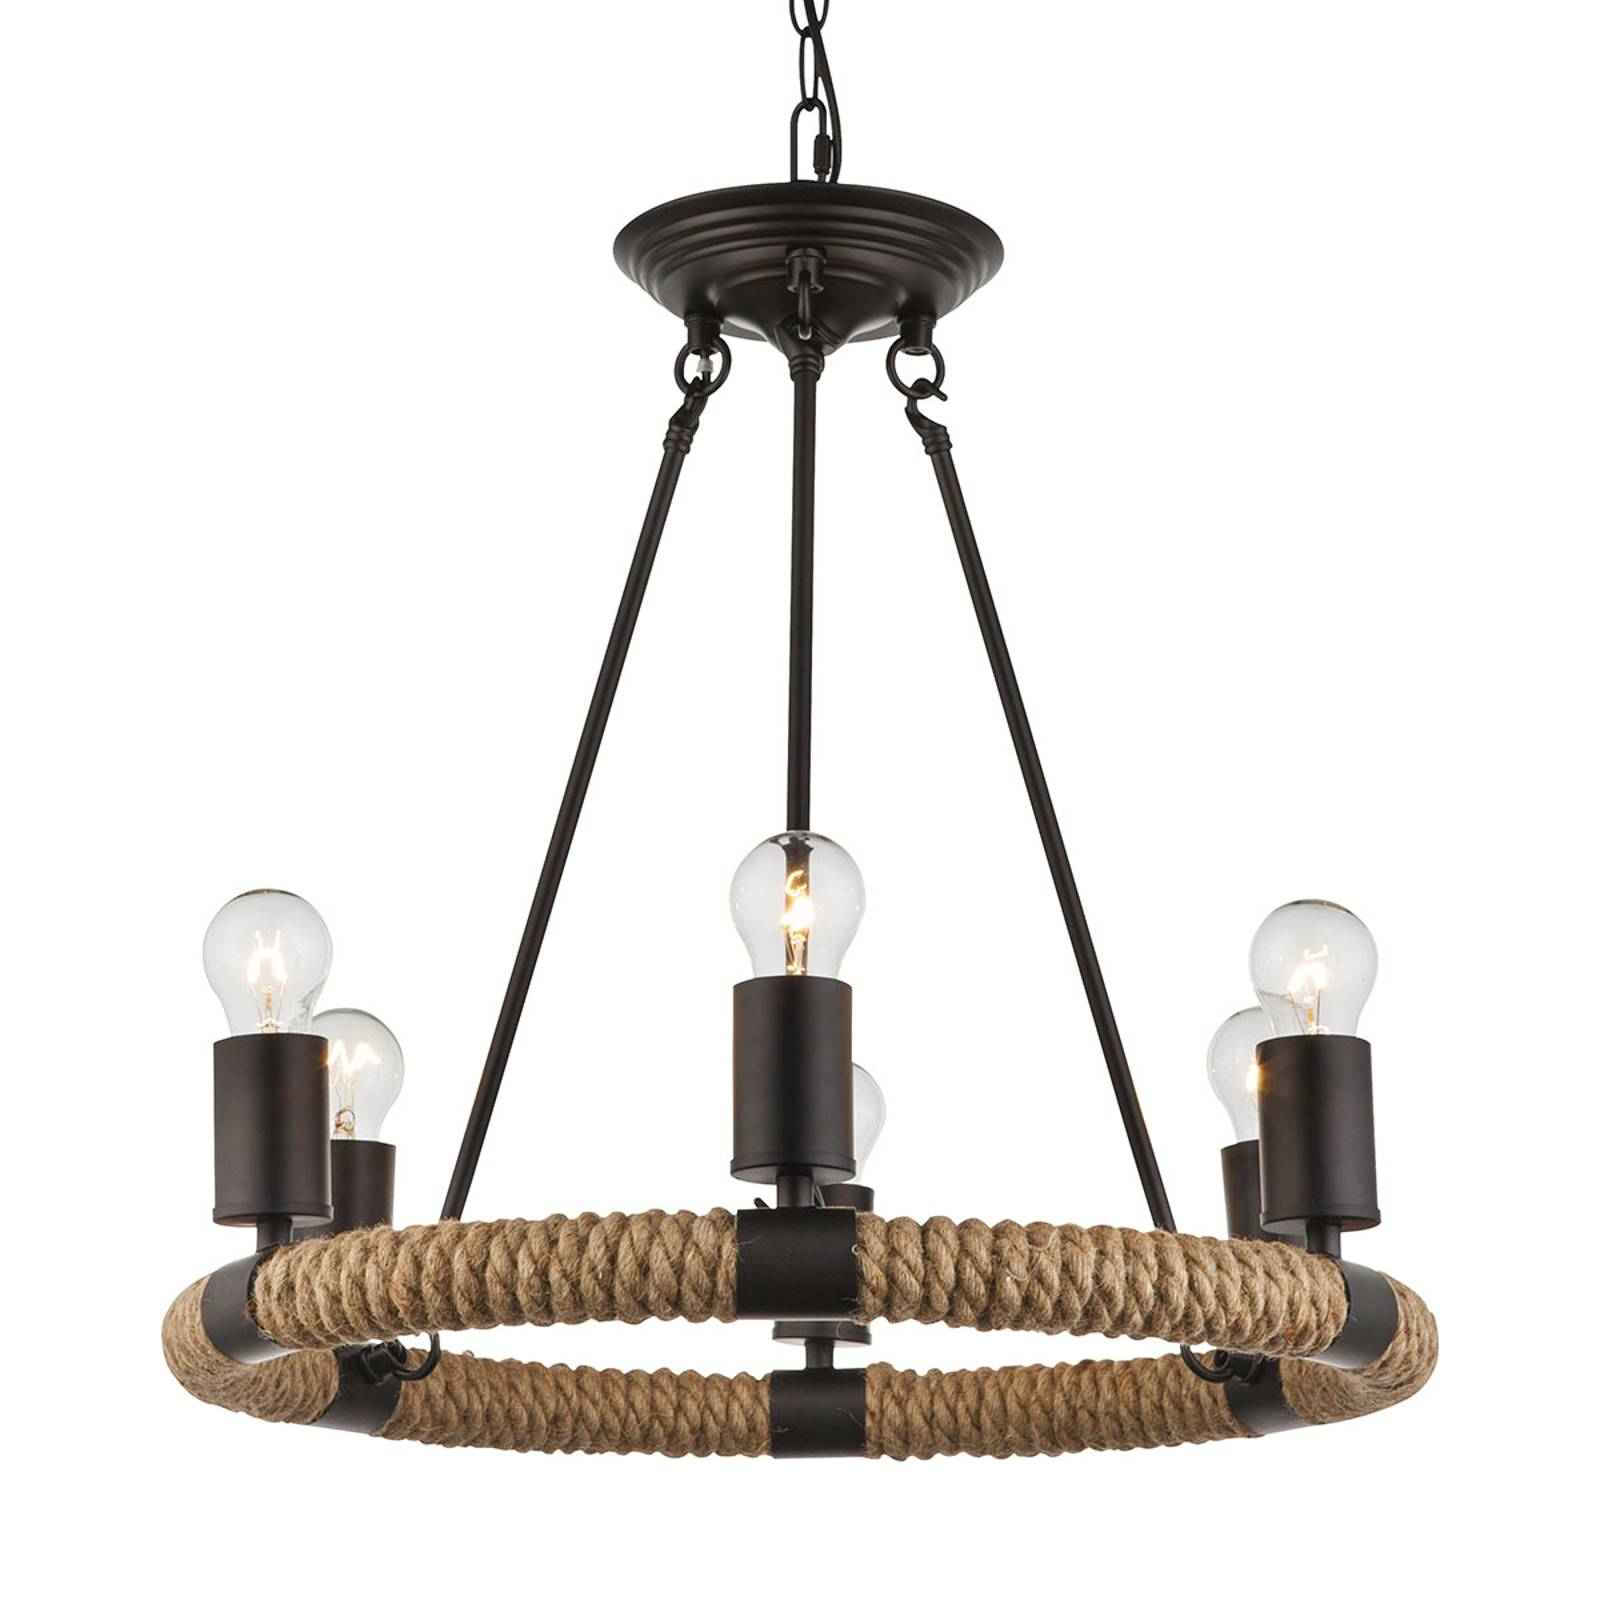 Runde LED-Pendellampe Ulleu mit Hanfseil 6-flg.